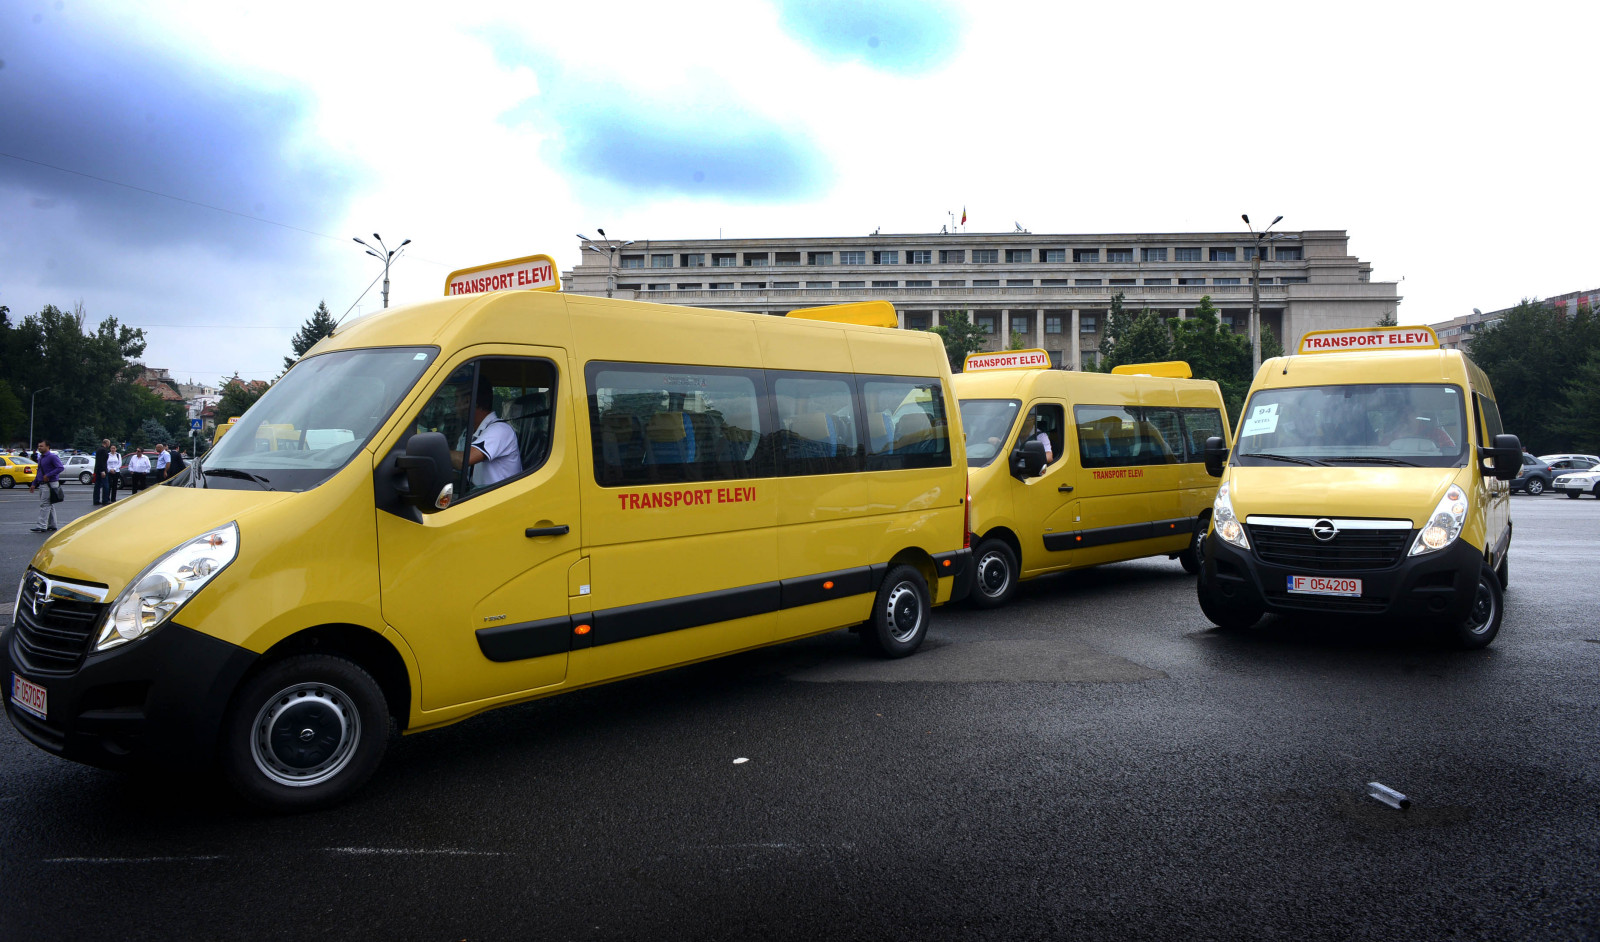 microbuze scolare FOTO Cotidianul